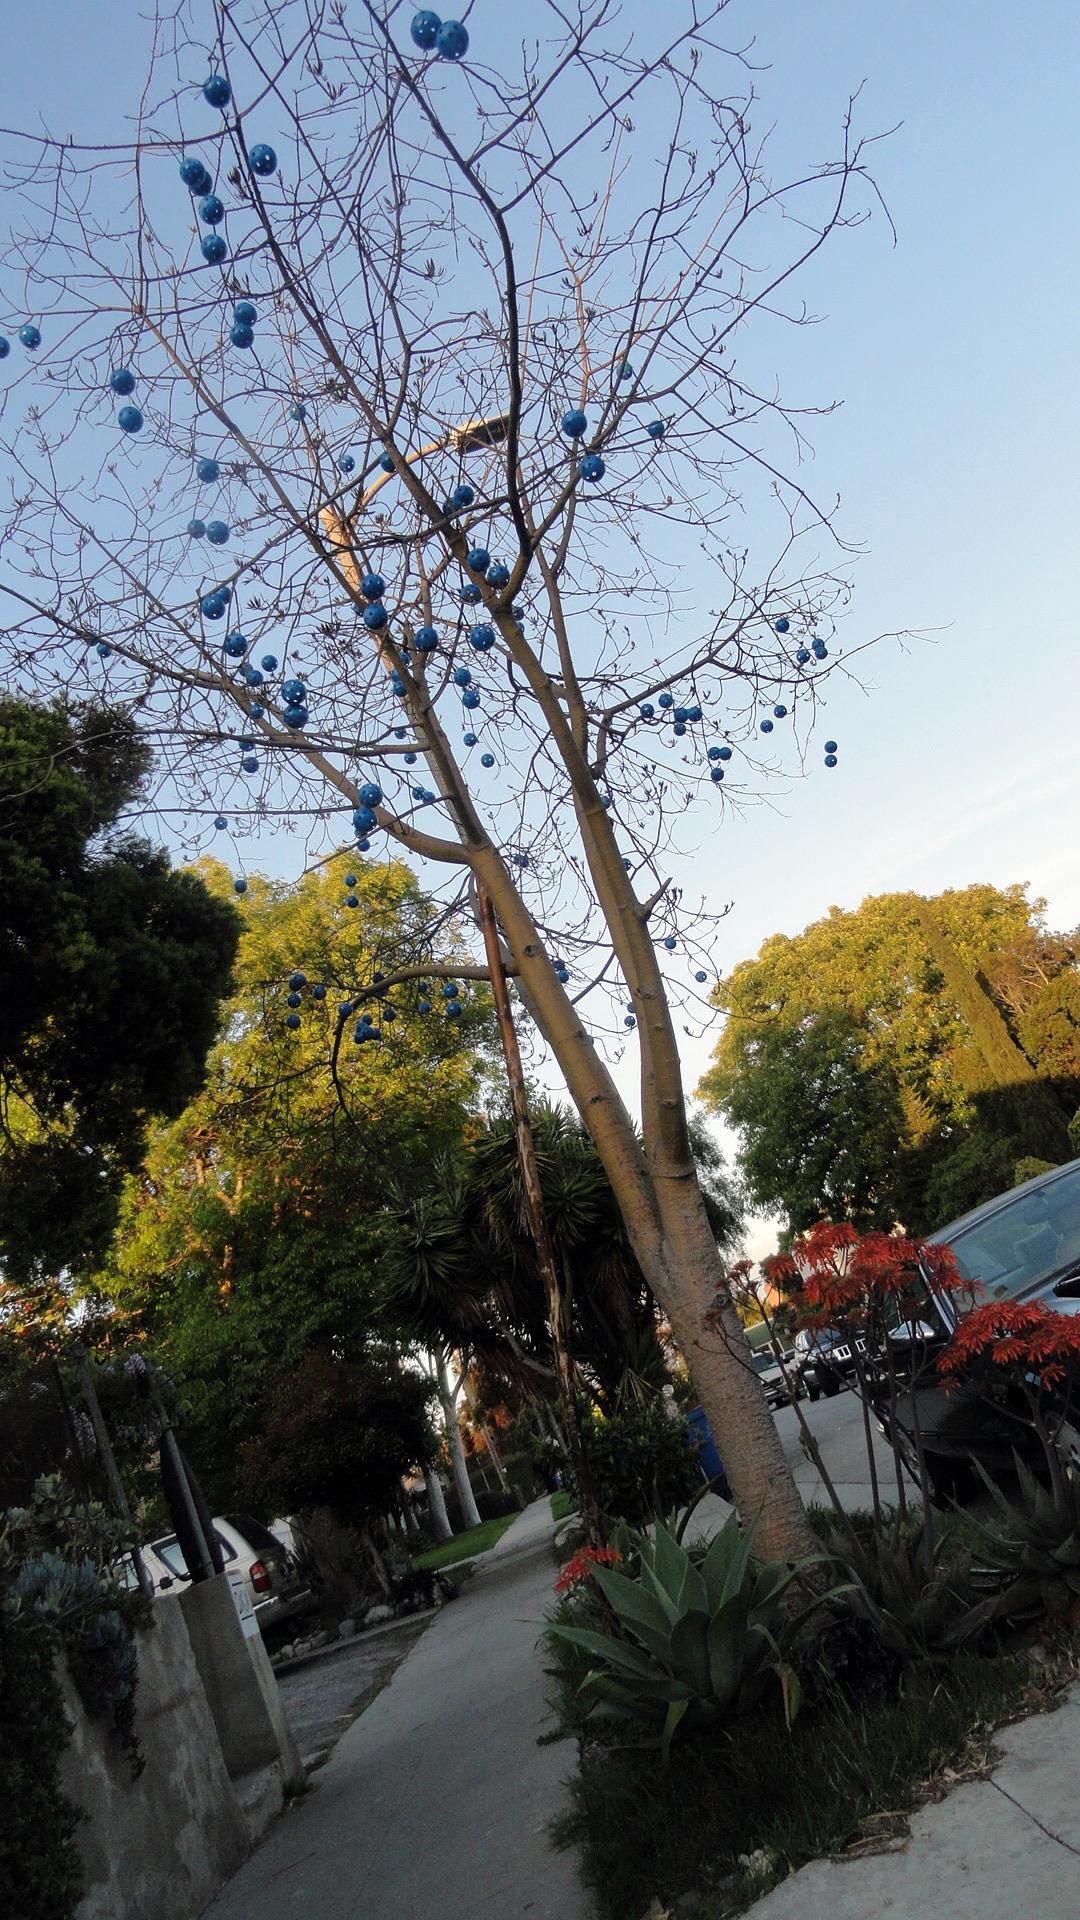 Venice - Decorated Tree